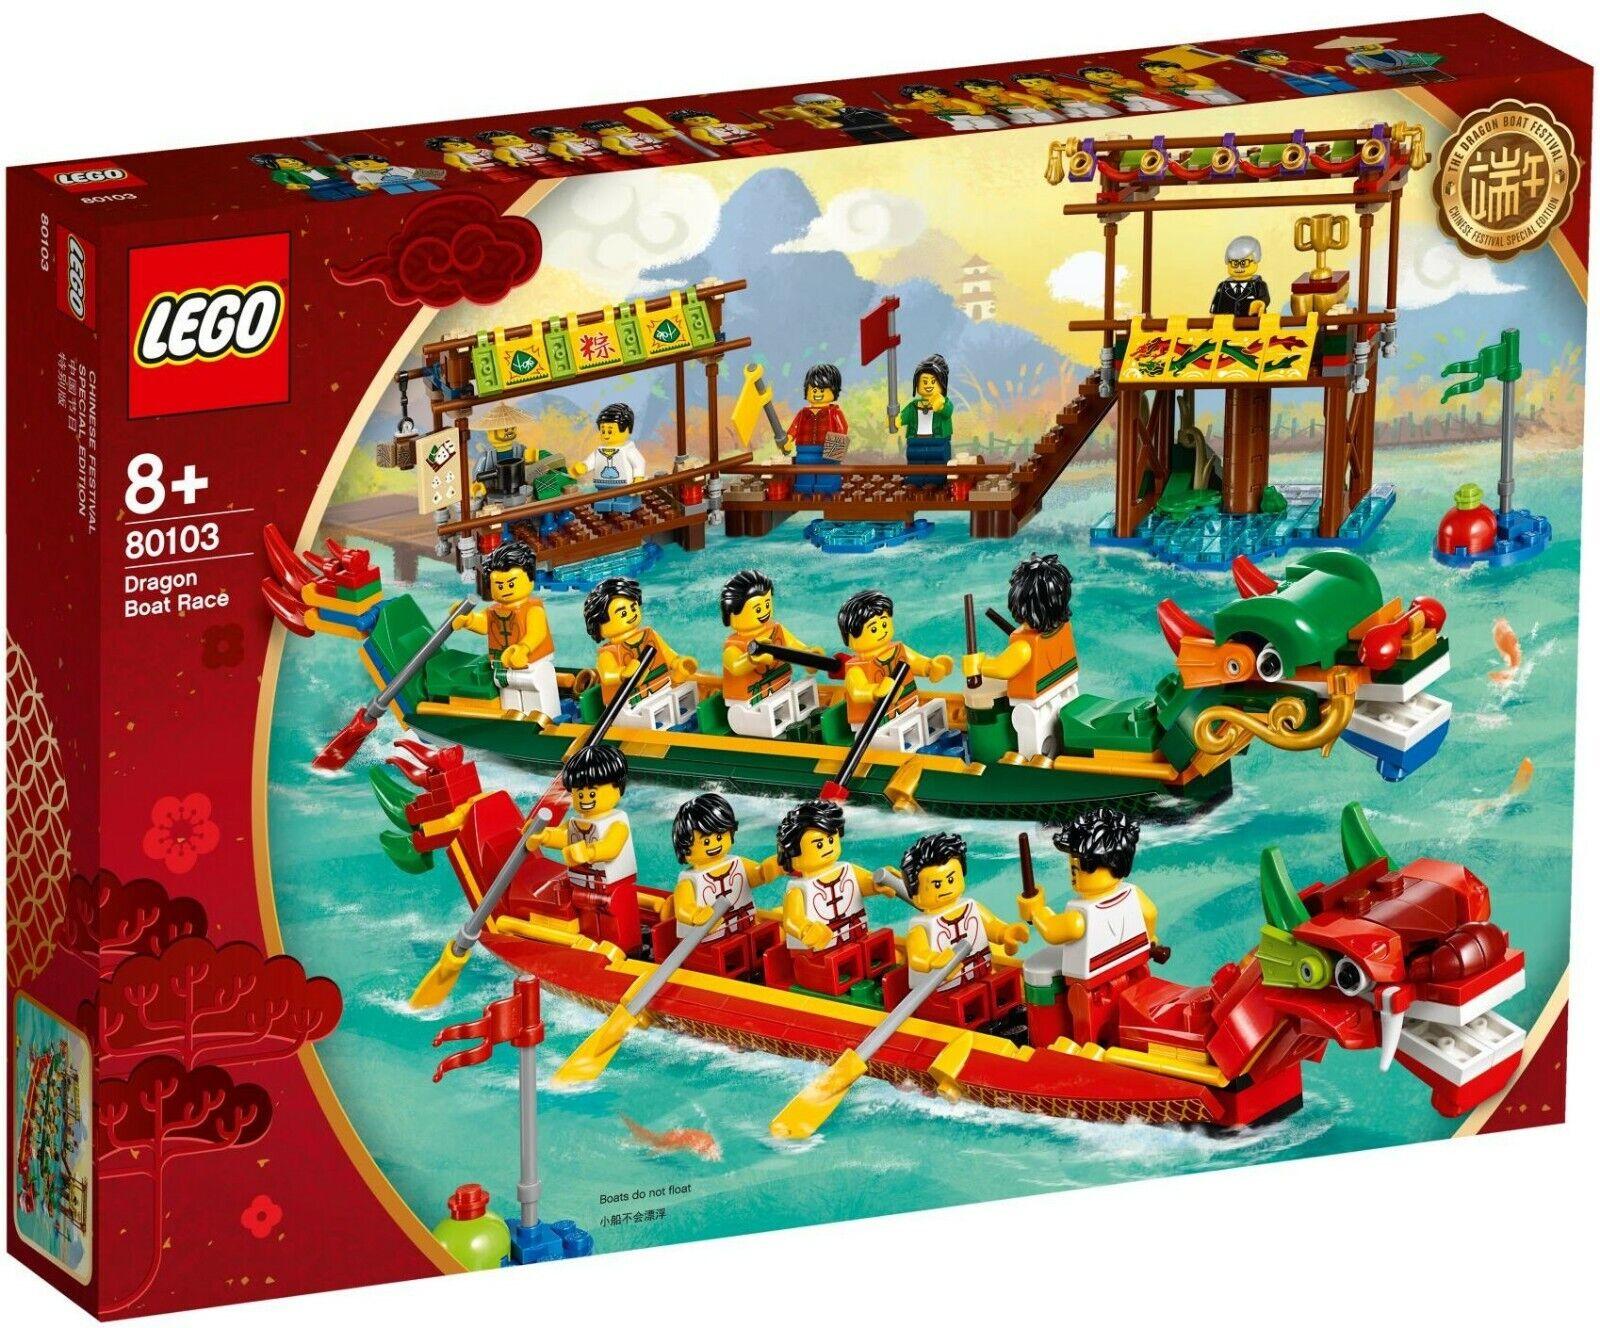 LEGO Saison   Seasonal 80103 - Dragon Boat Race - Collector Asia 2019 - 100% NEW